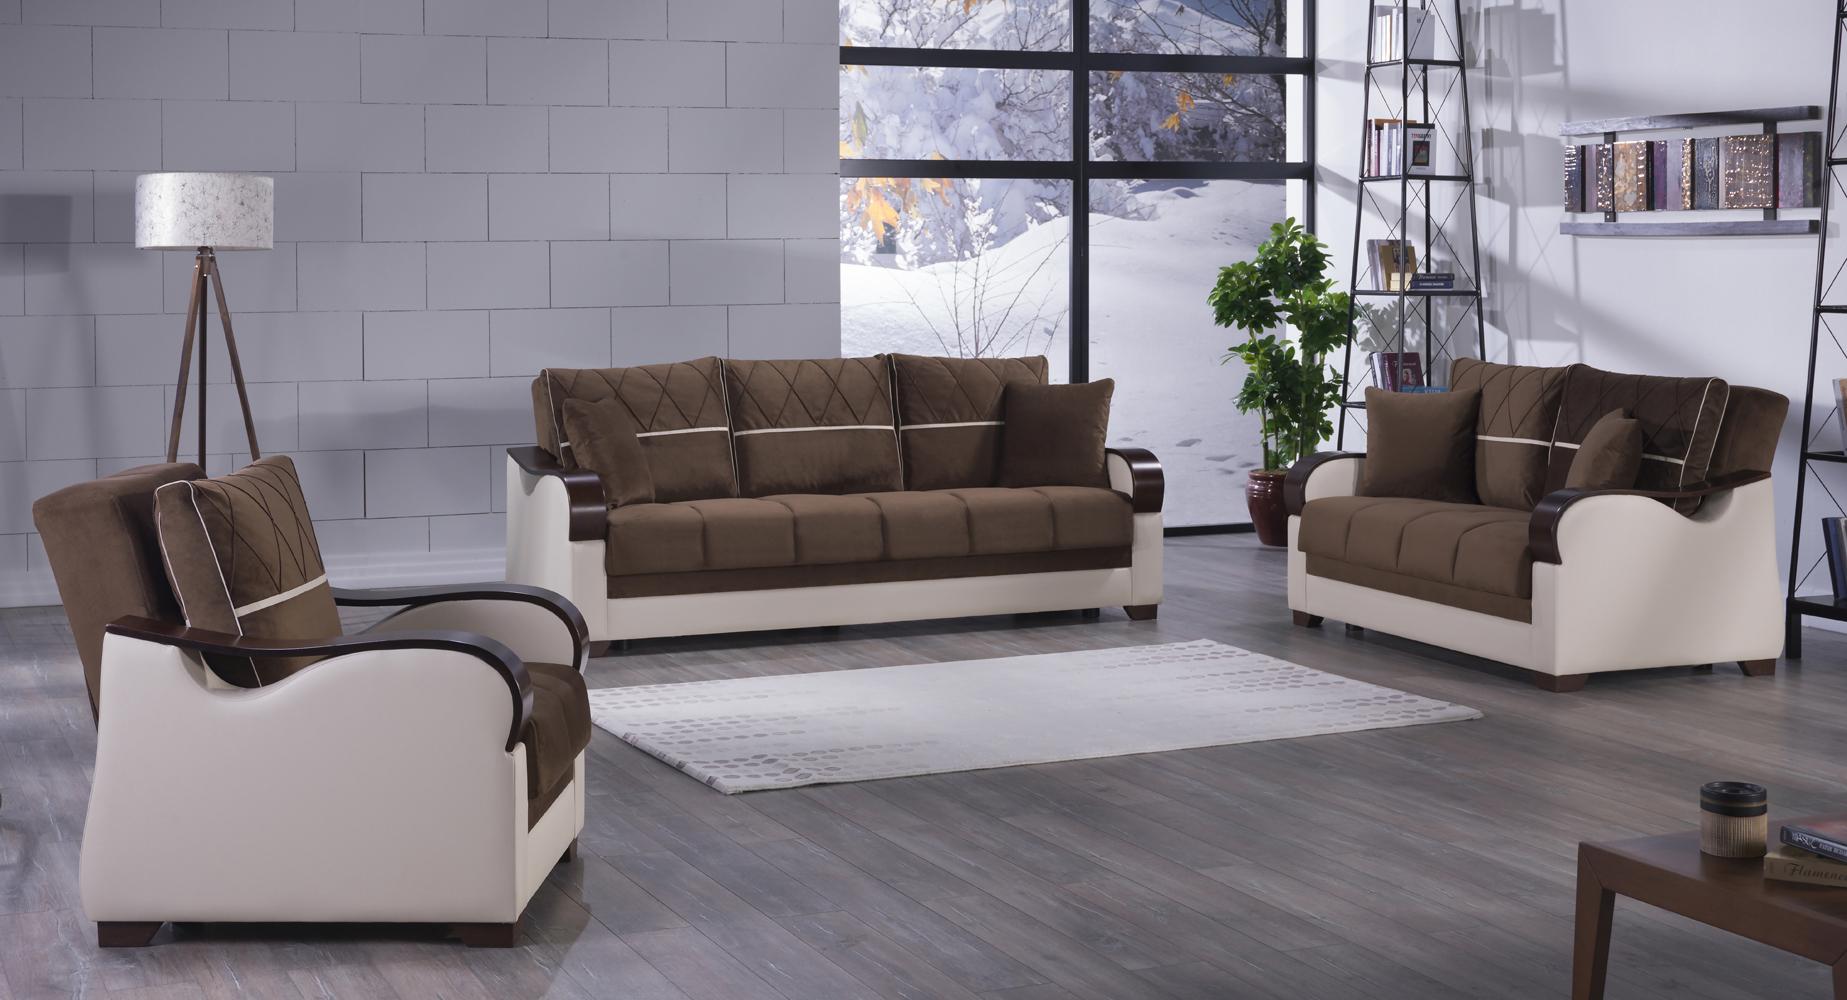 Bennett Best Brown Sofa, Love & Chair Set by Istikbal Furniture